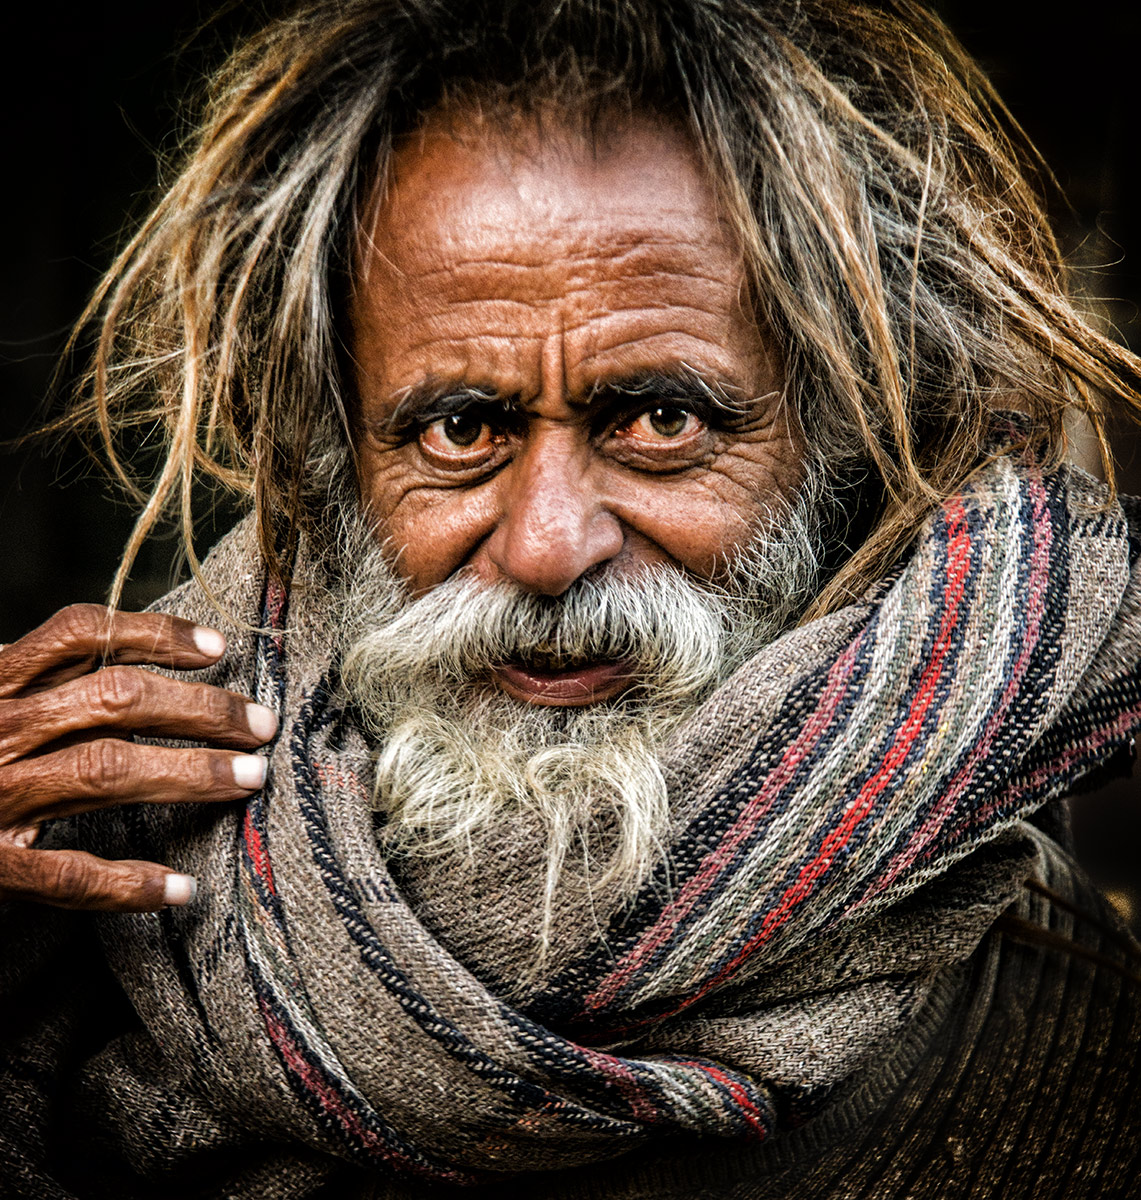 Indian-man-at-church-2535